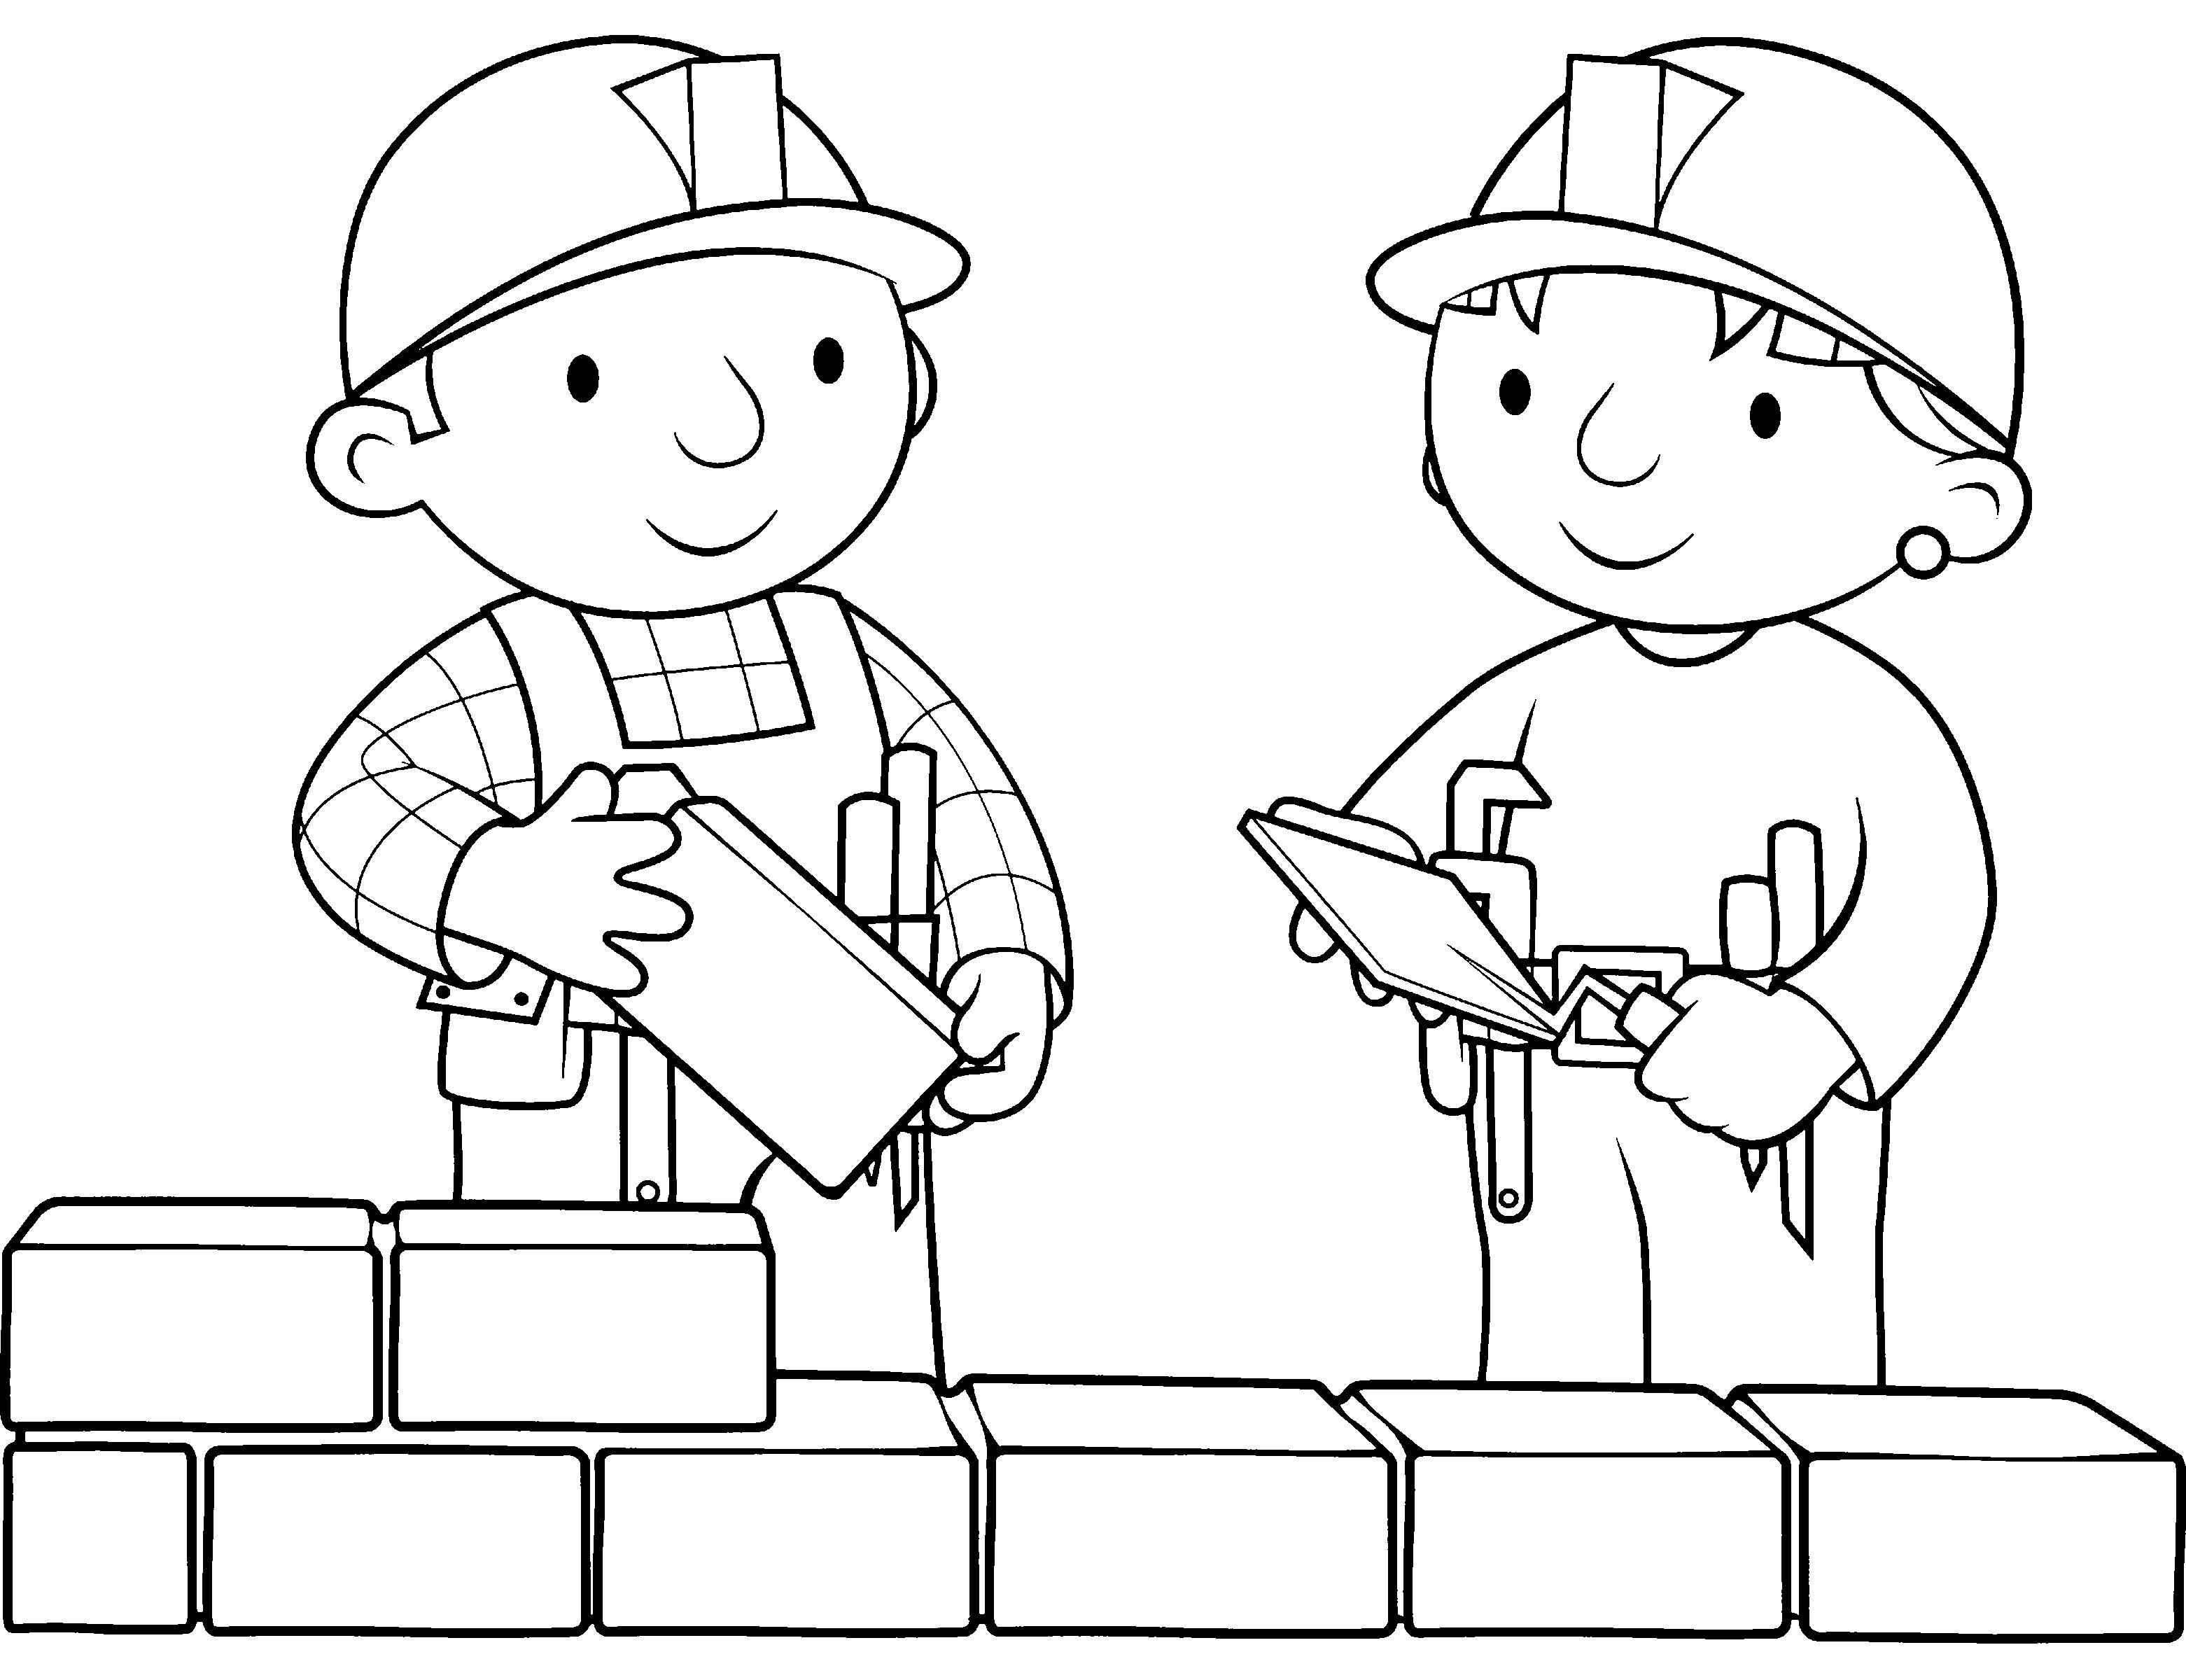 builder coloring pages - Google Search | Preschool Children ...